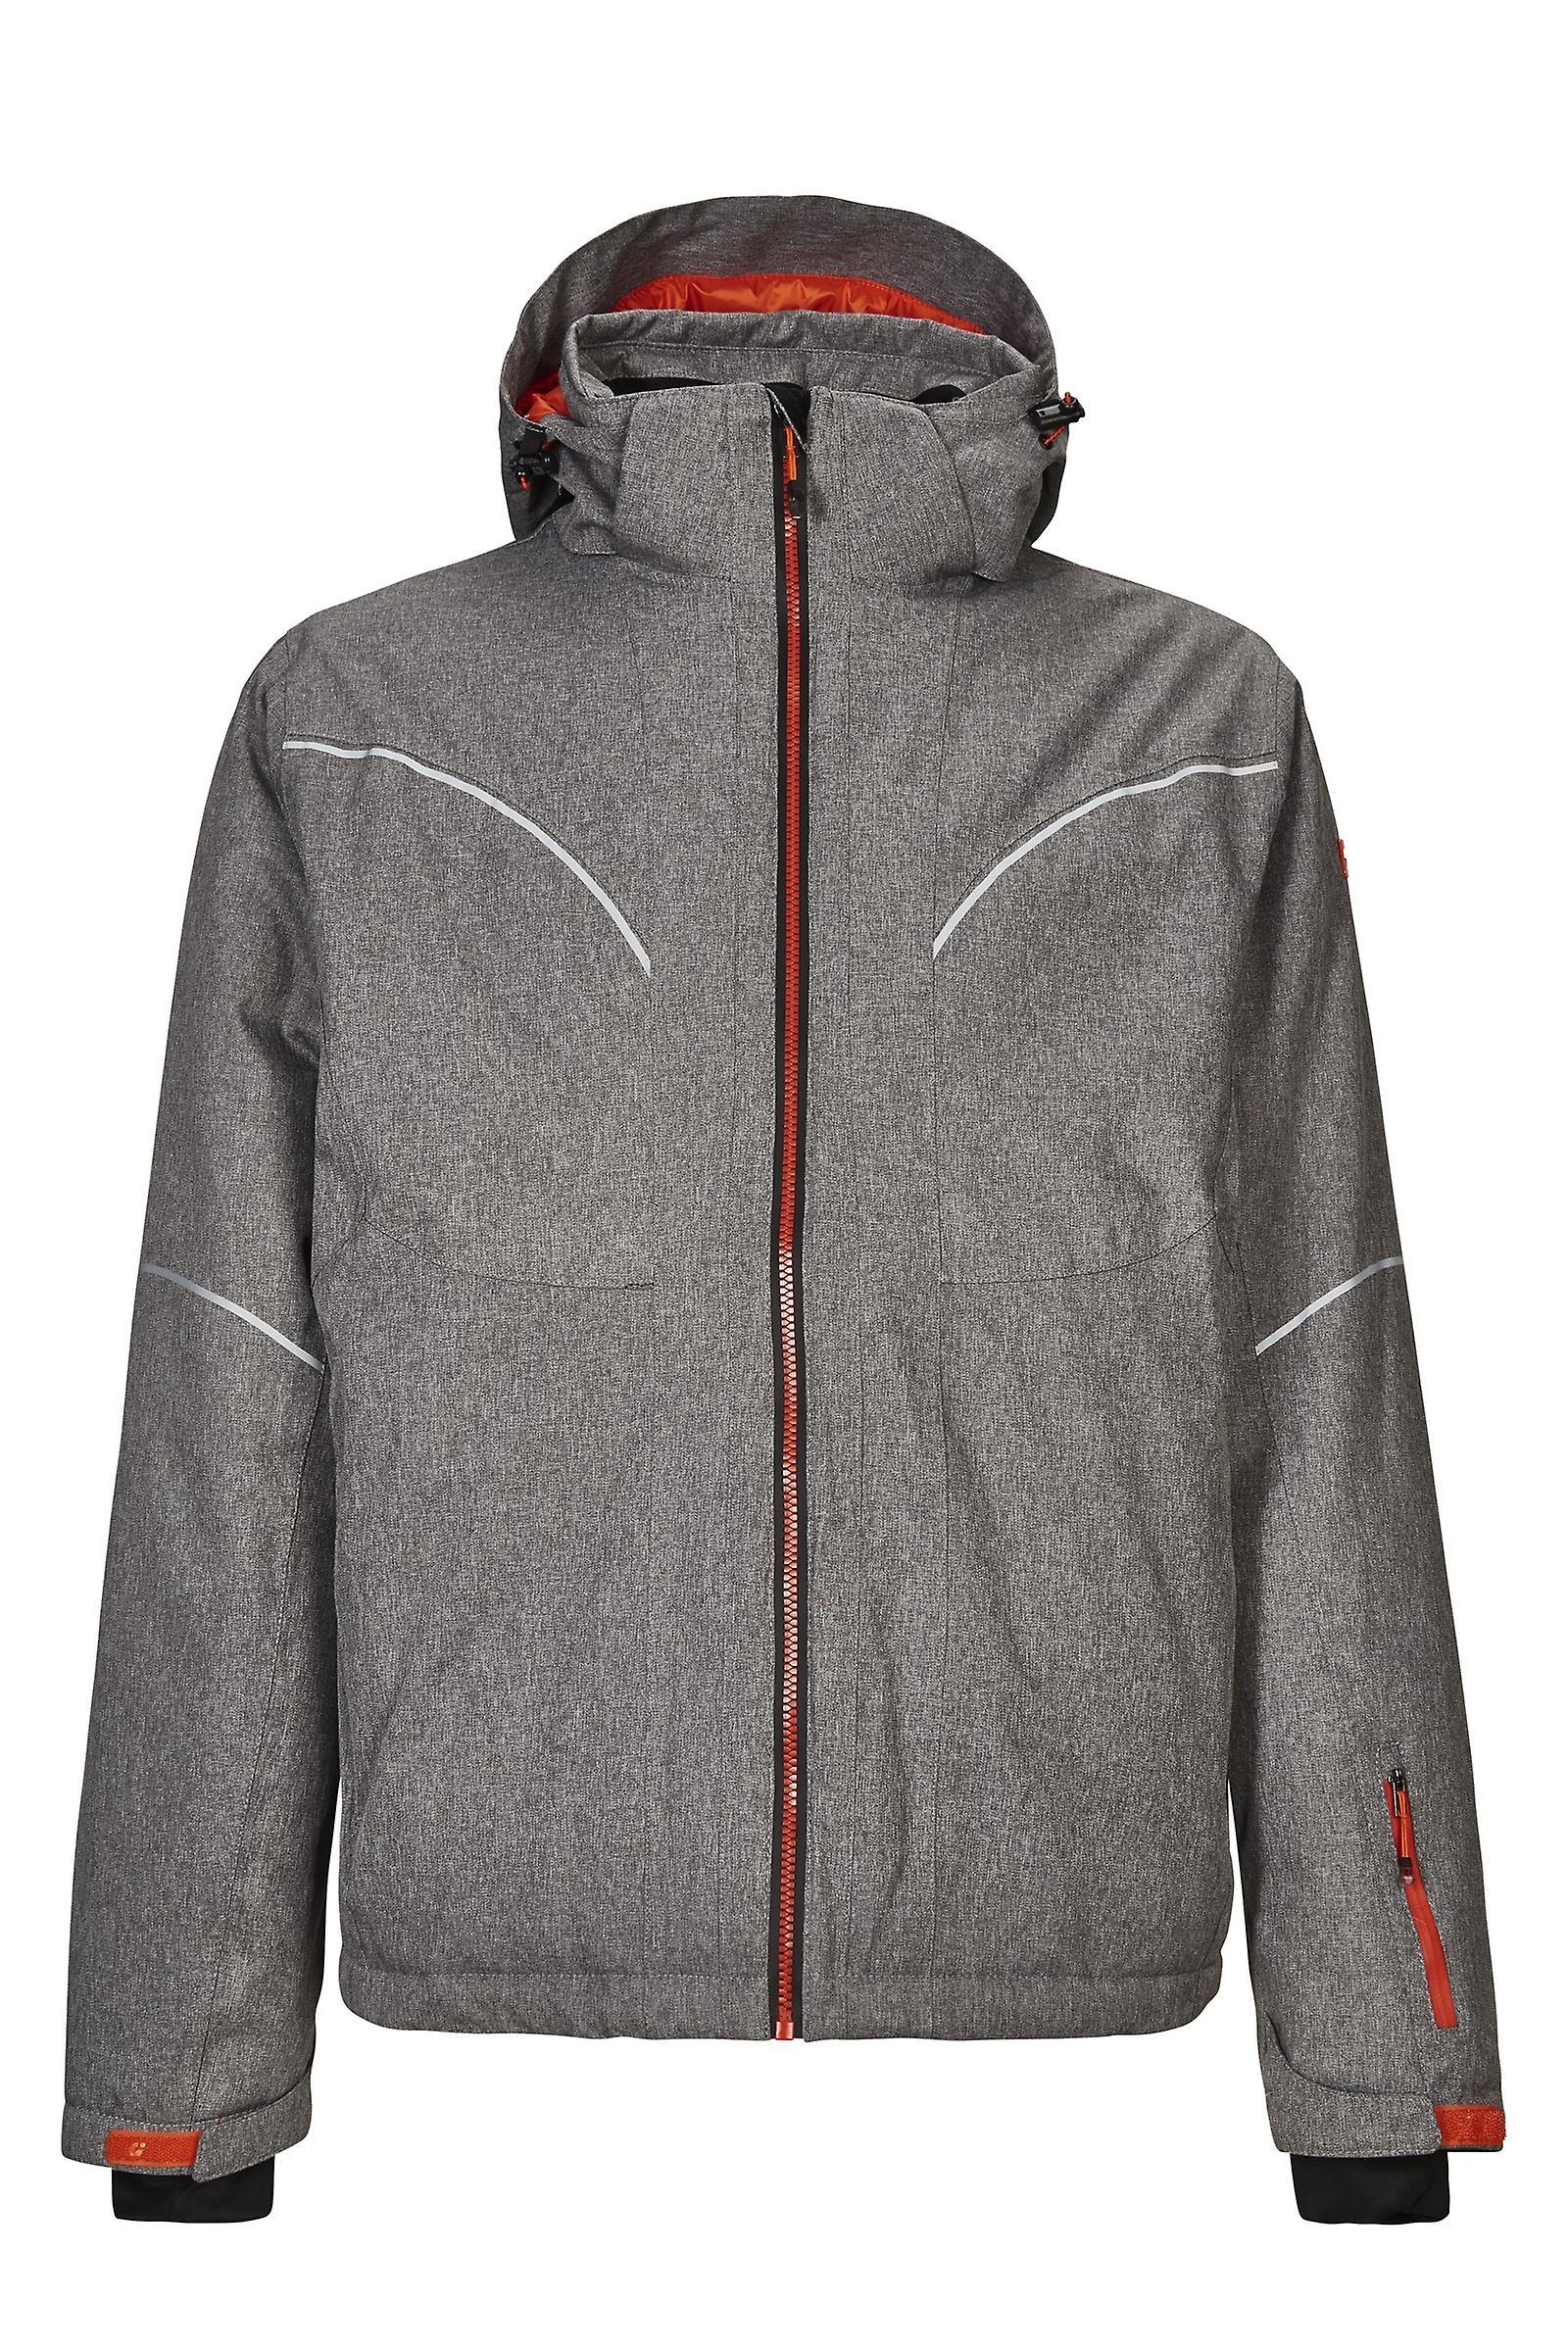 killtec Herre ski jakke Grecko | Fruugo NO